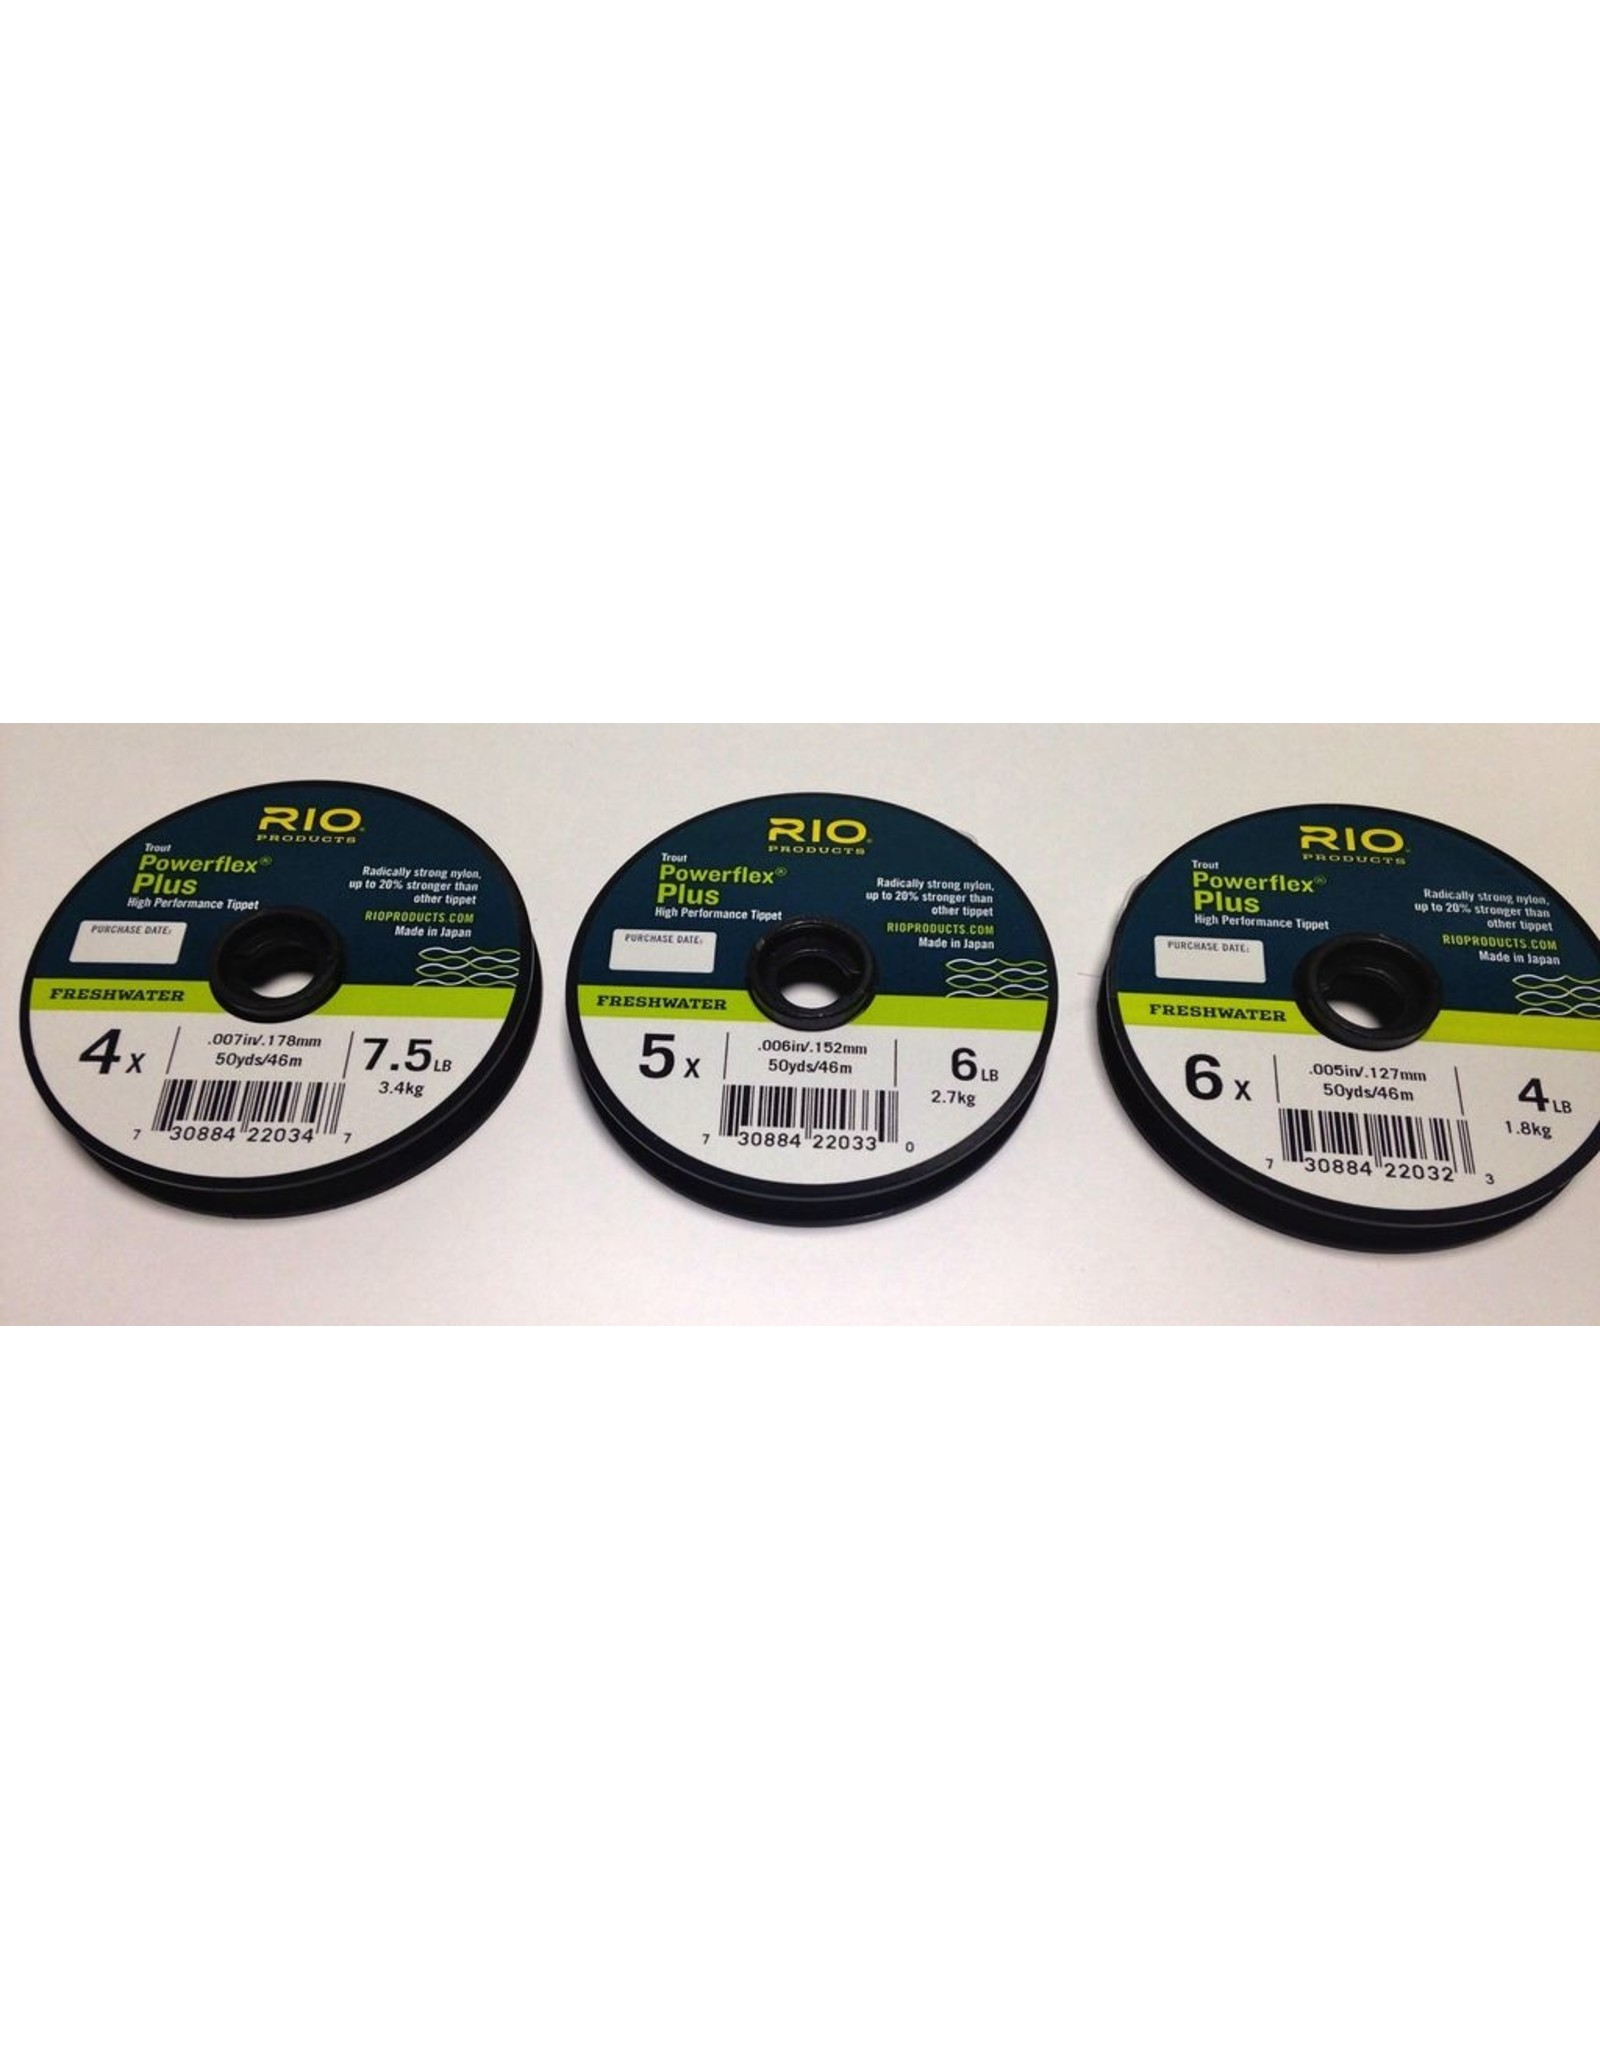 Rio Rio Powerflex Plus Tippet 3 Pack, 4X, 5X, 6X